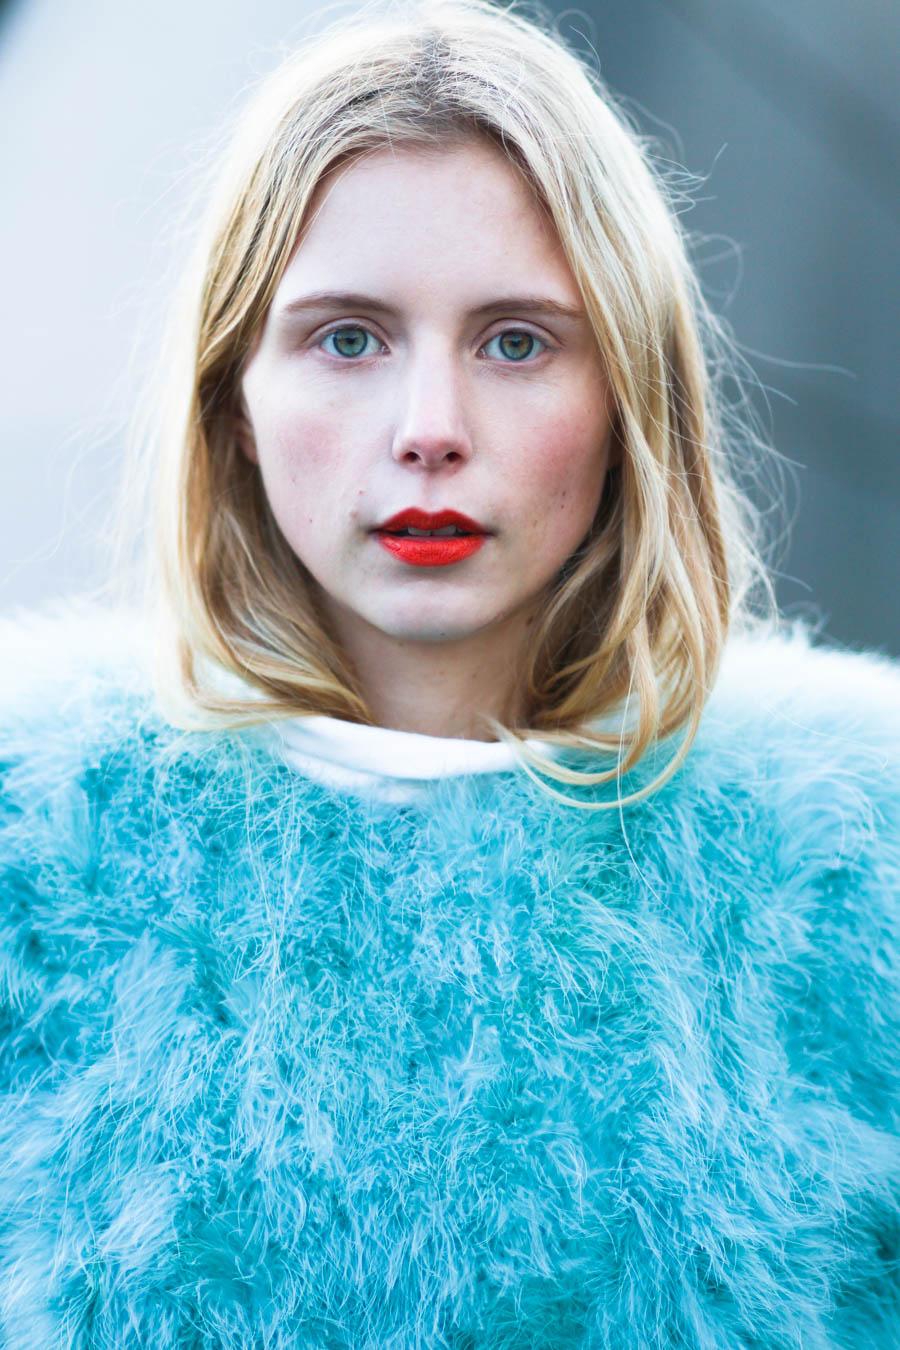 outfit December nemesis babe marie jensen danish blogger -4-3